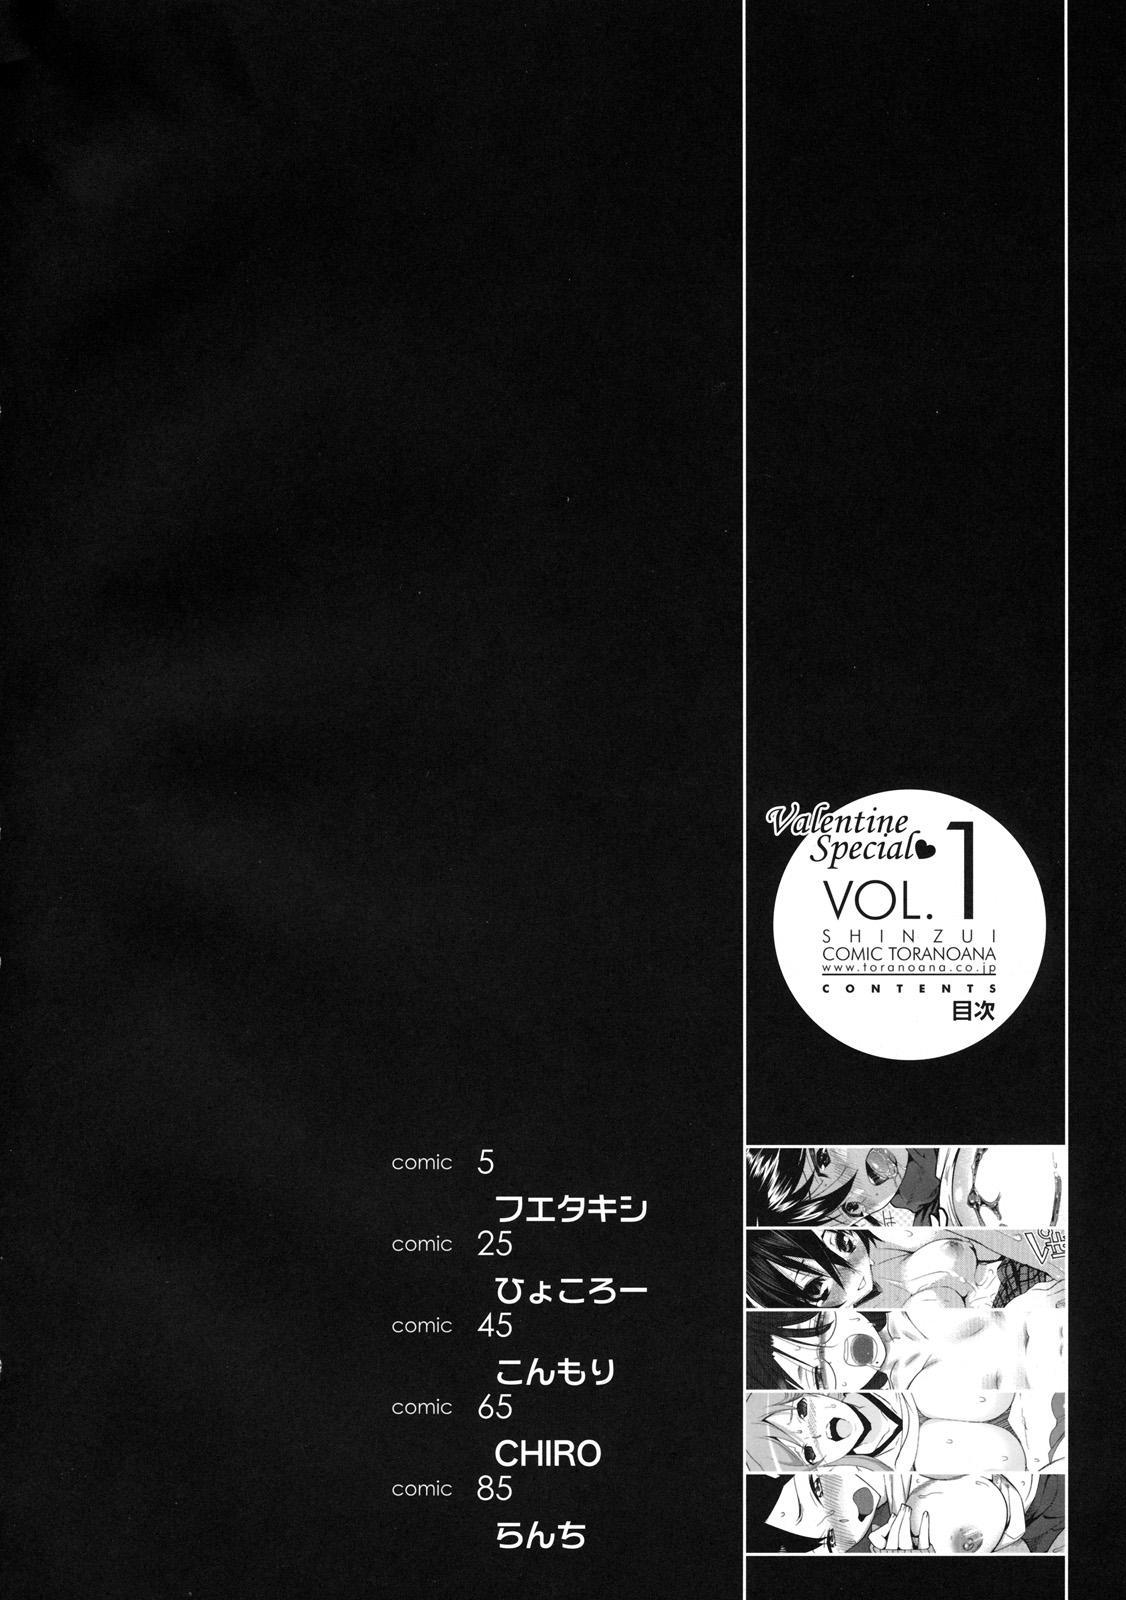 Shinzui Valentine Special Vol. 1 2